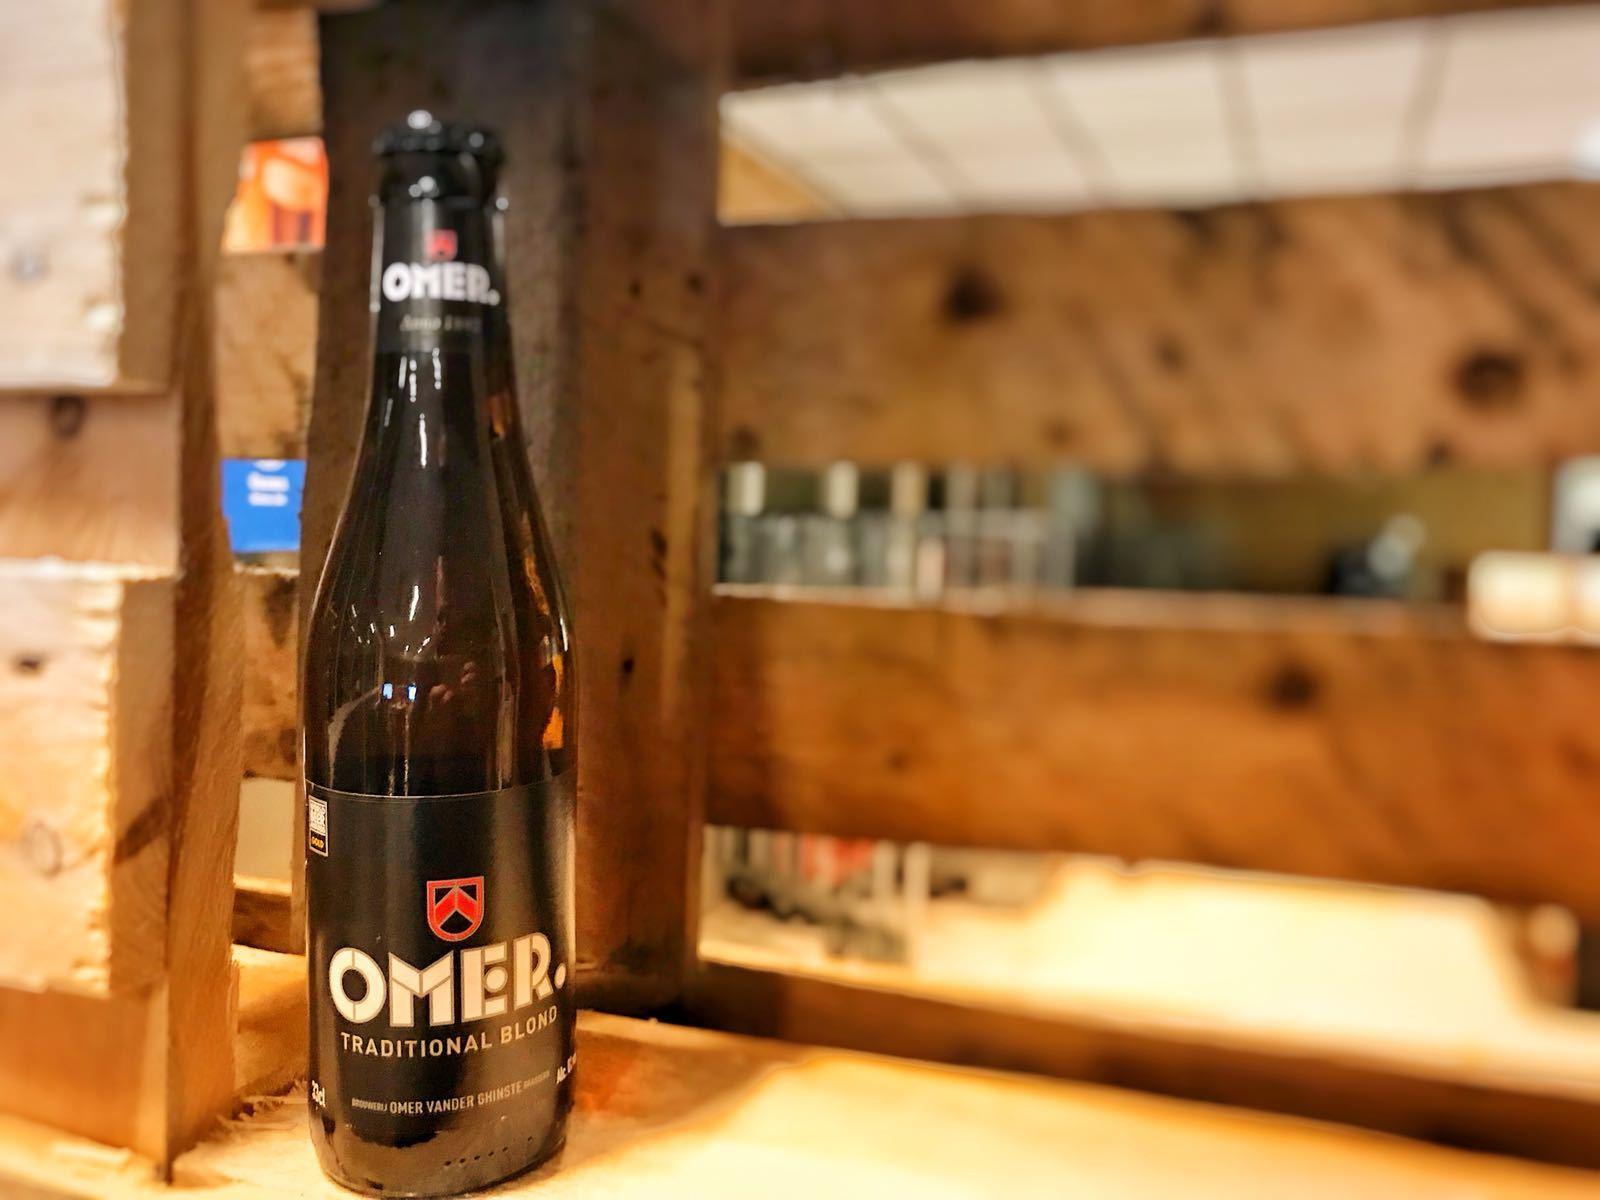 Omer Traditional Blond van Brouwerij Omer Vander Ghinste